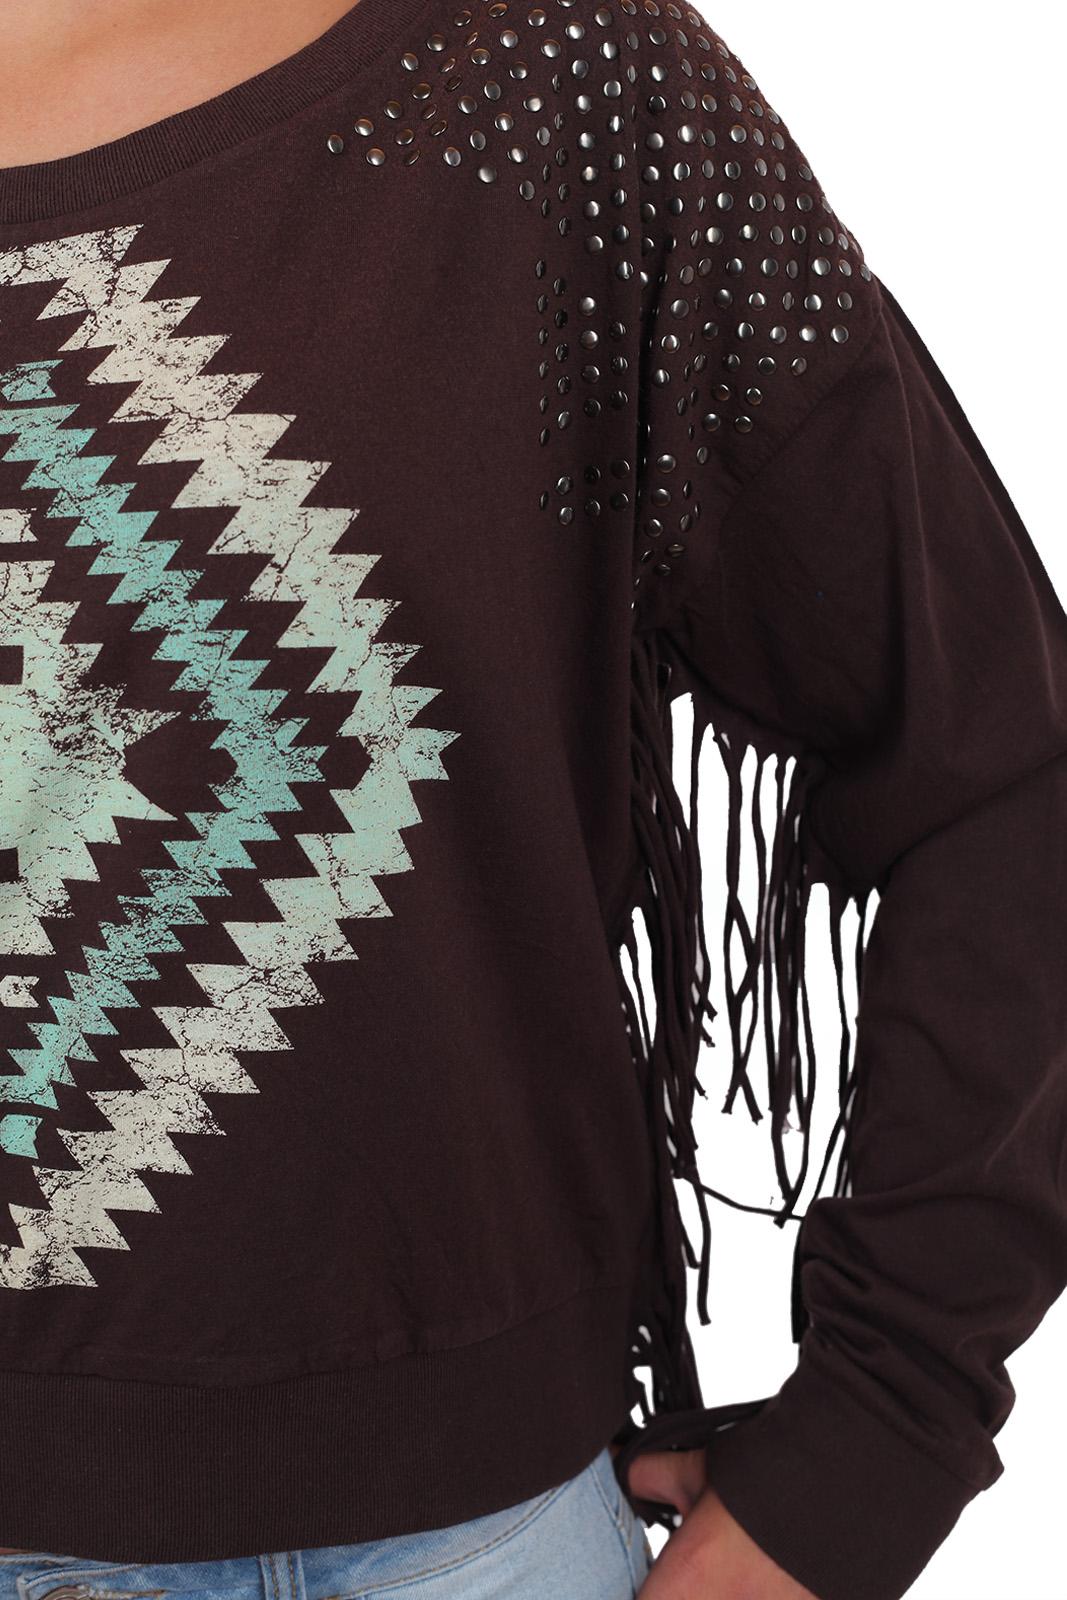 Женский свитер свитшот Rock and Roll Cowgirl. Дизайнерский стиль кантри на грани моды и искусства. Фишки модели: бахрома-лапша, клёпки и принт!